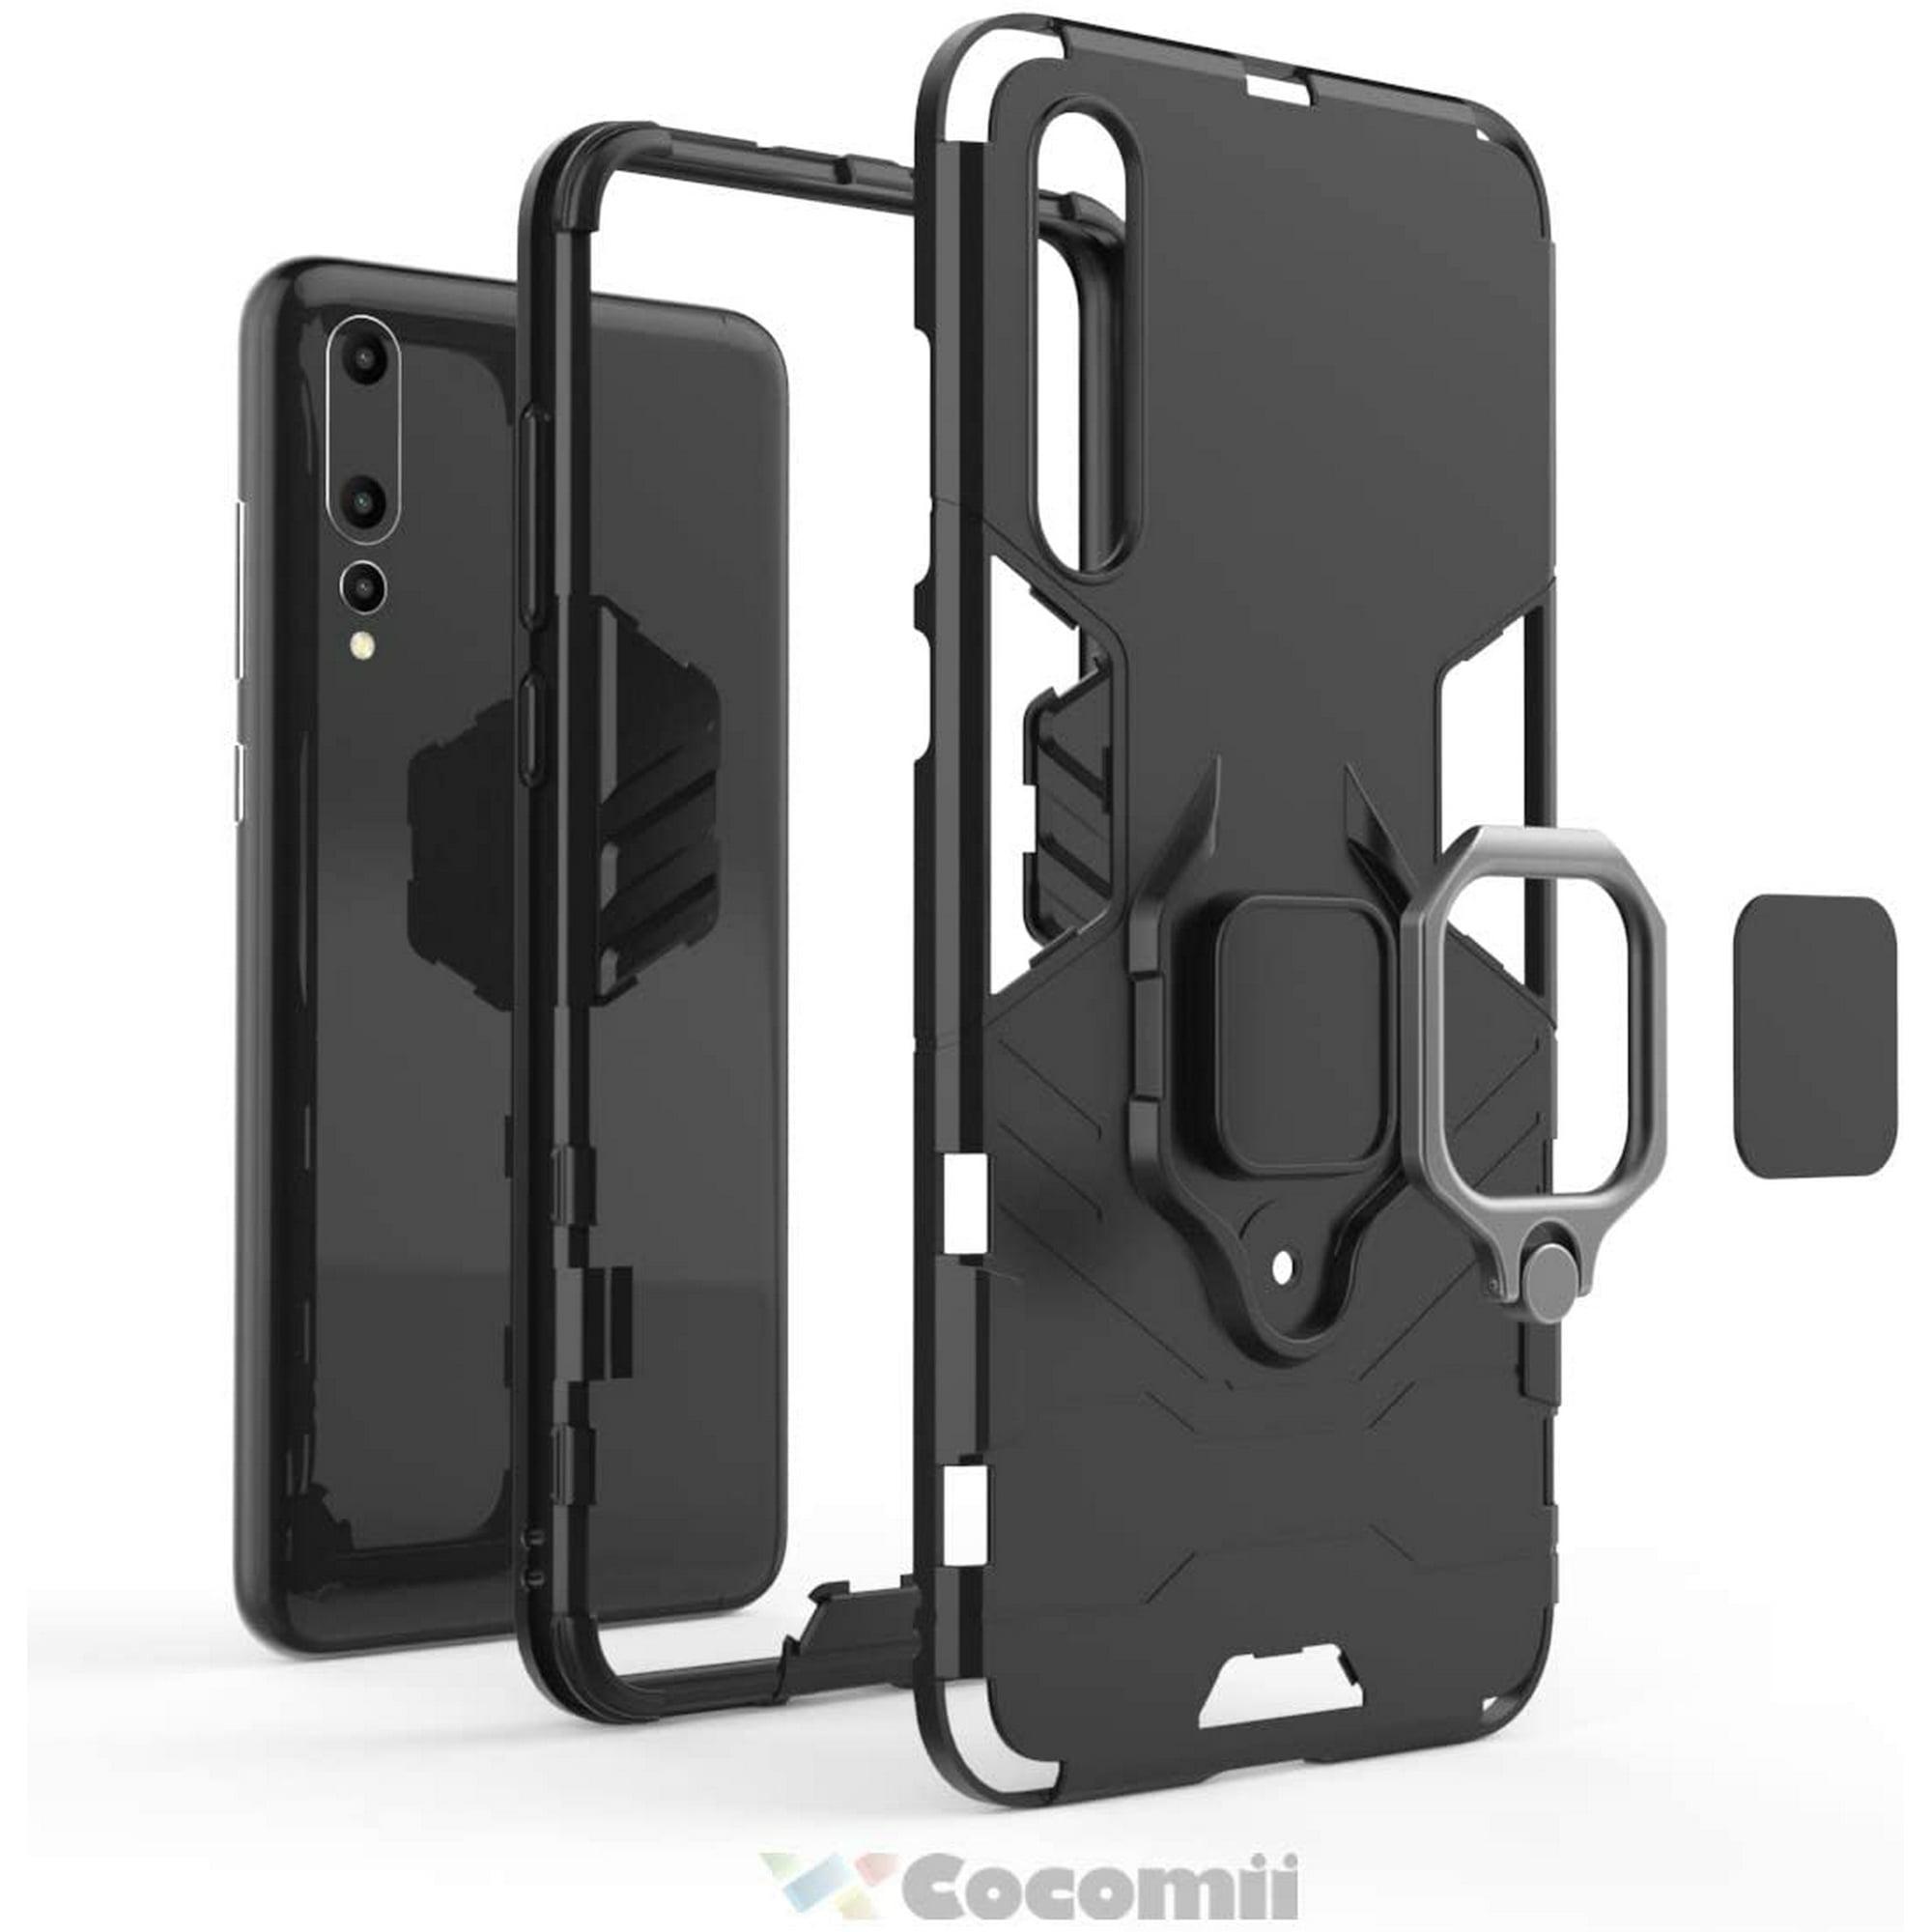 Cocomii Black Panther Ring Huawei P20 Pro Coque Svelte Mince Mat Kickstand Verticale /& Horizontale Poign/ée Annulaire Case Bumper Cover /Étui Housse Compatible with Huawei P20 Pro Jet Black